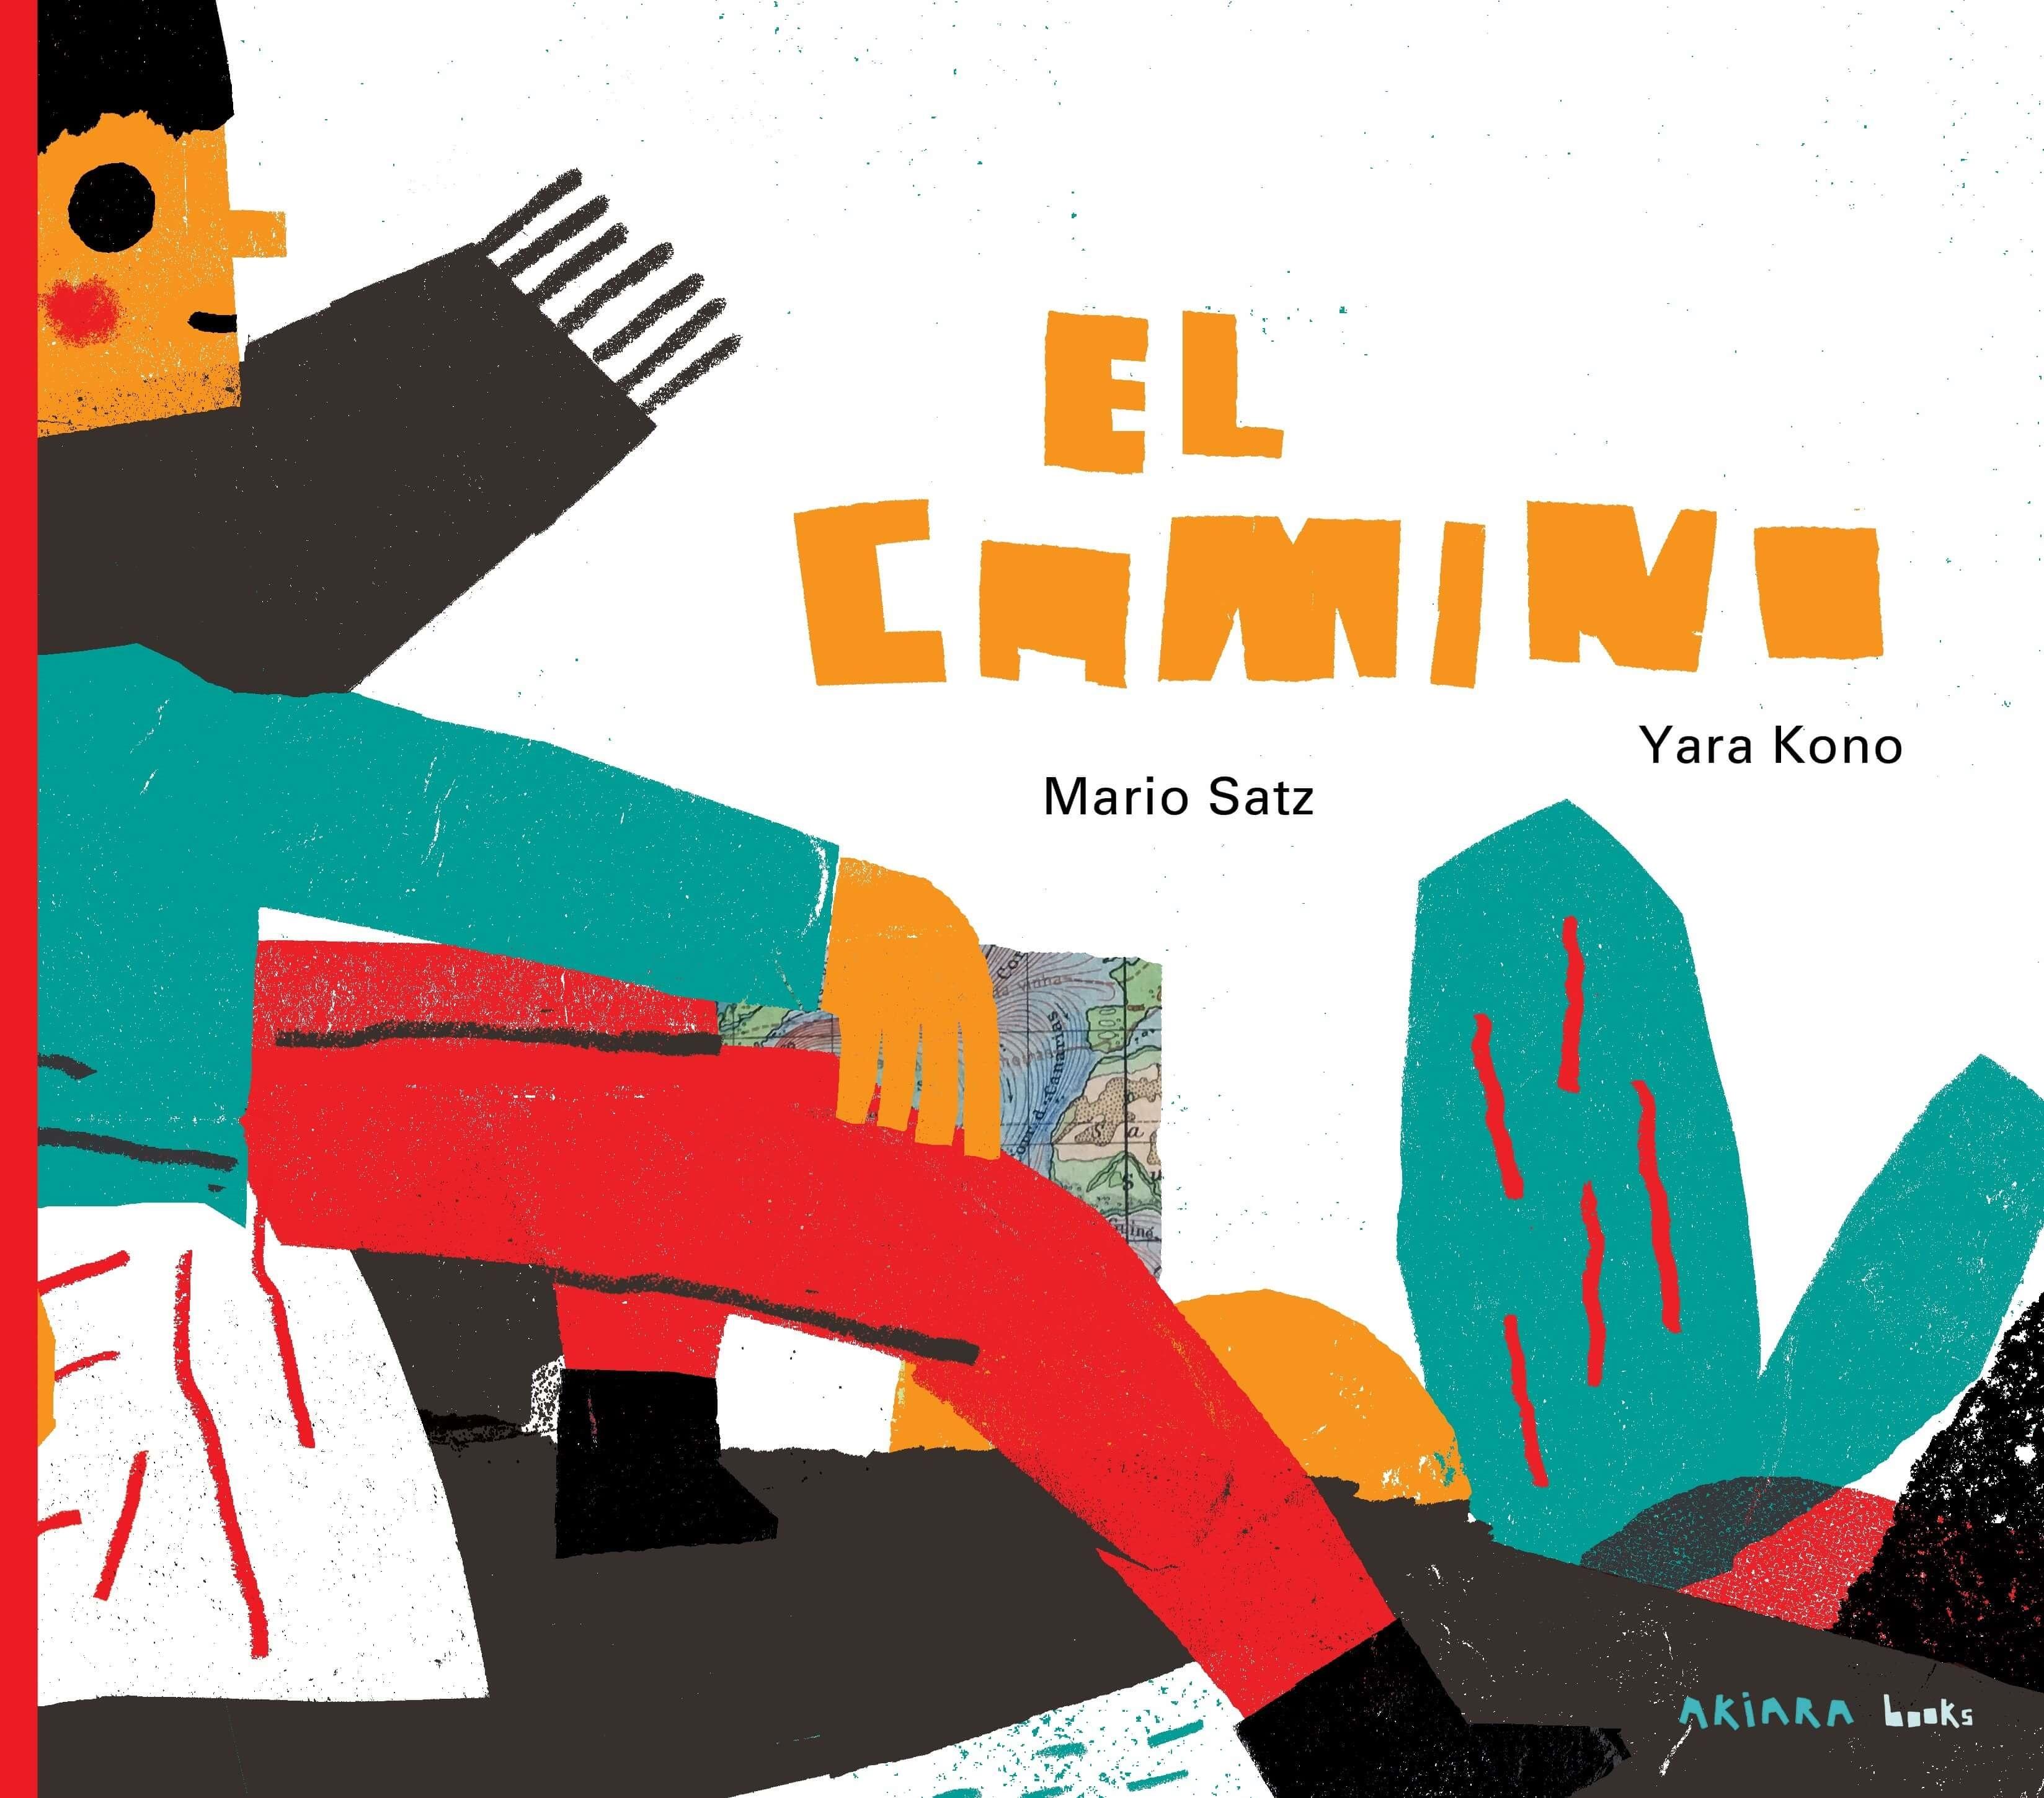 AKIARA EL CAMINO COVER